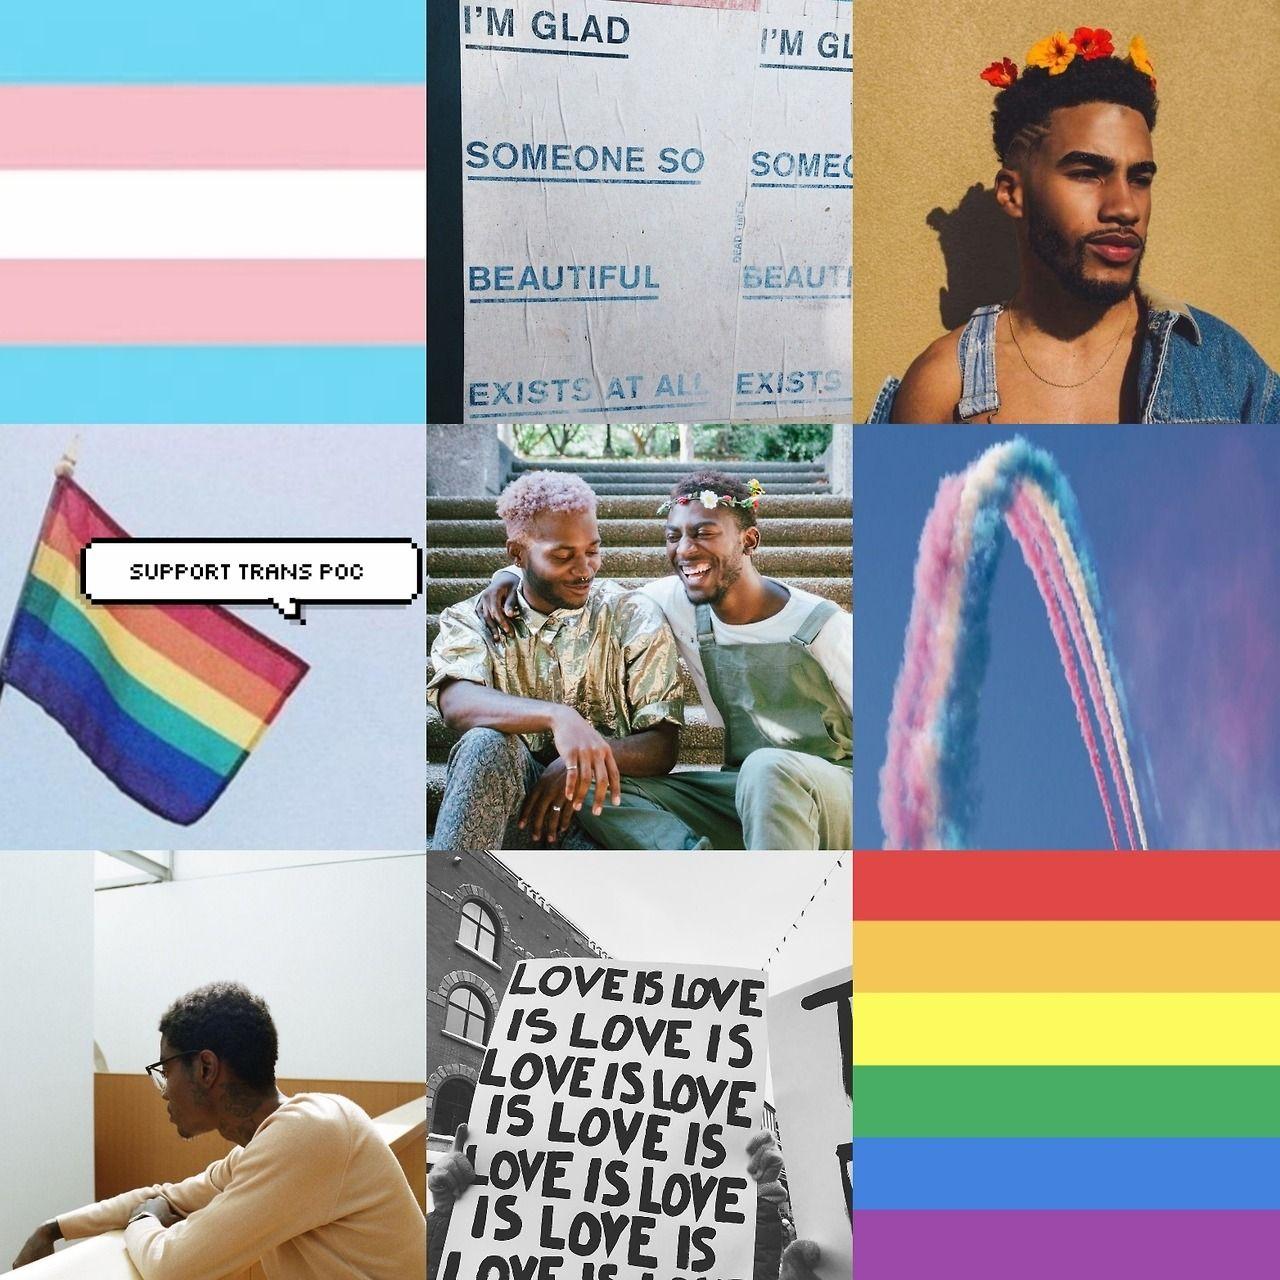 Gay lesbian gl transgender